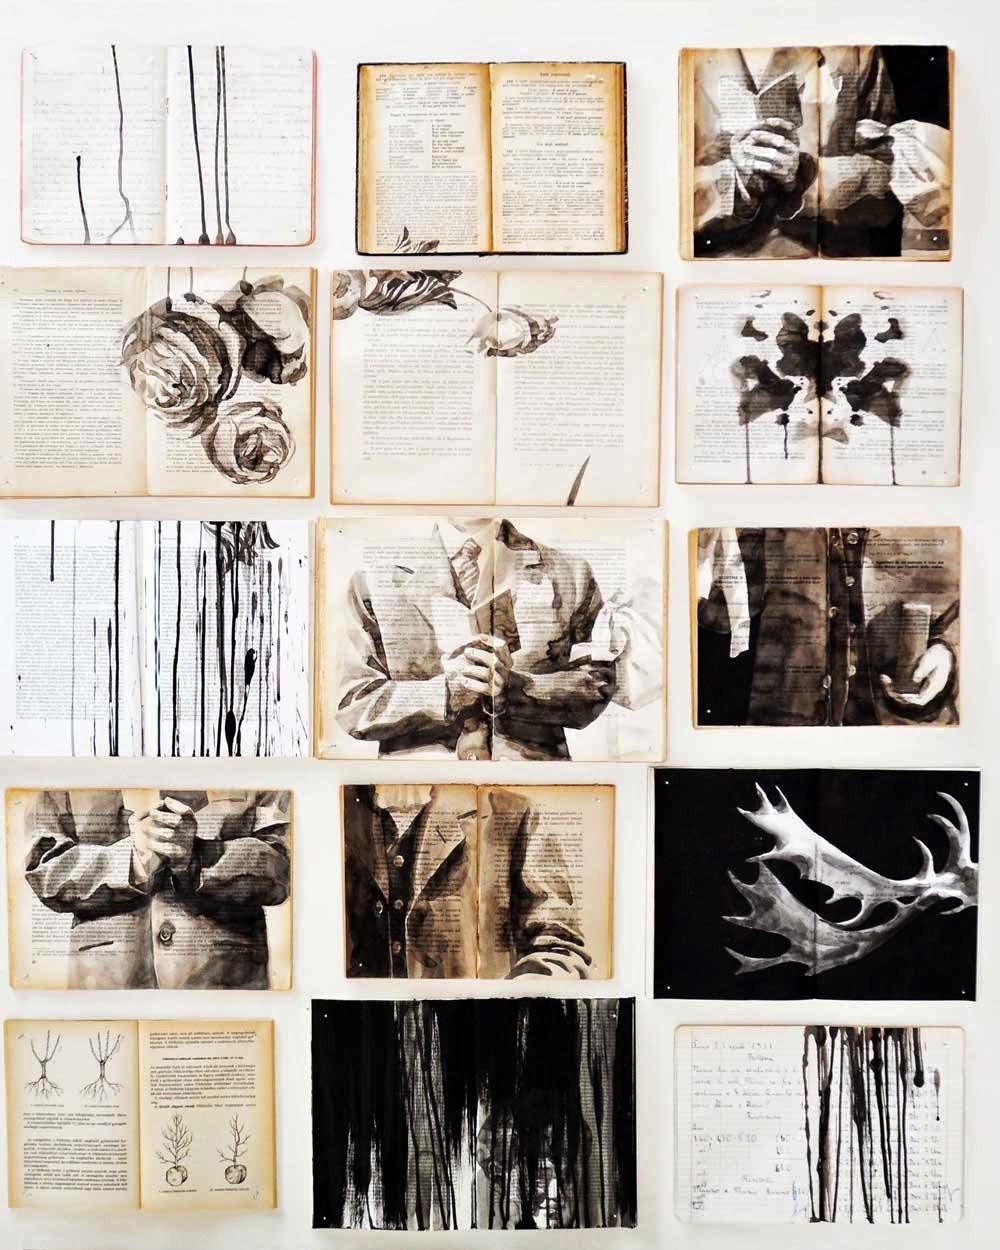 sir john lawes art faculty apart and or together edexcel gcse 2015 collage working over old books. Black Bedroom Furniture Sets. Home Design Ideas